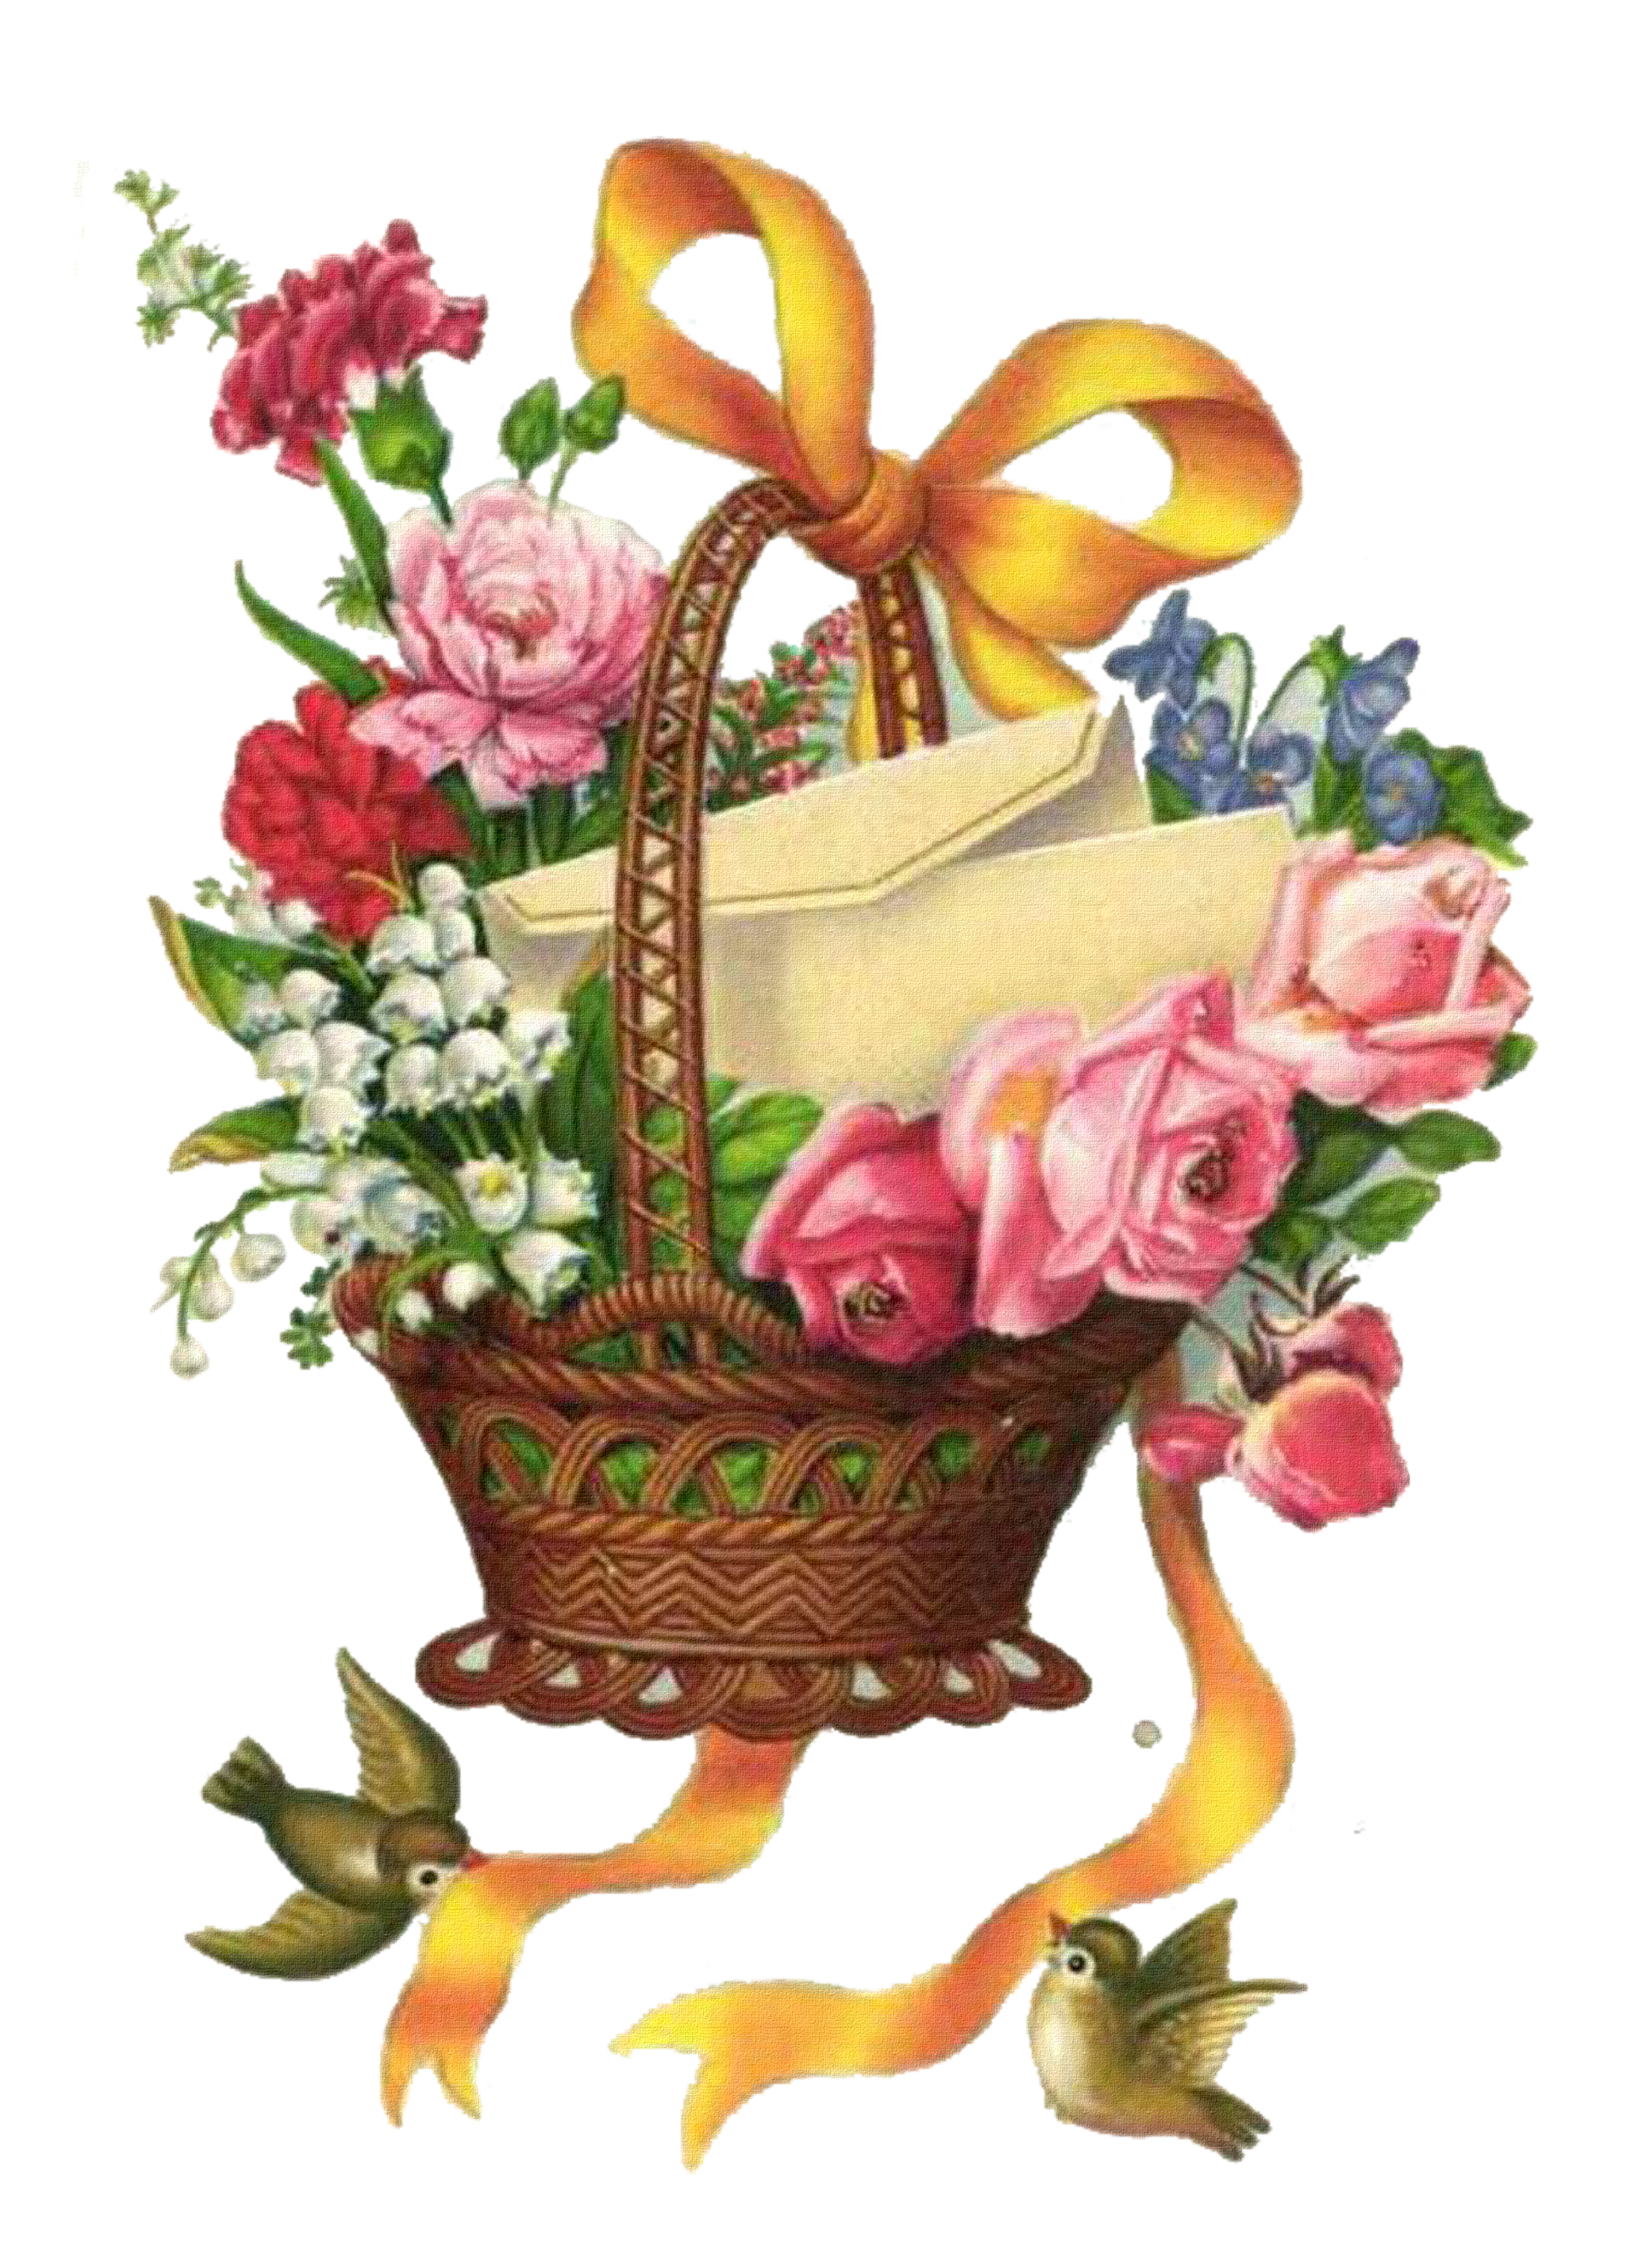 http://img-fotki.yandex.ru/get/5008/valenta-mog.197/0_77b41_f3e218eb_orig.png